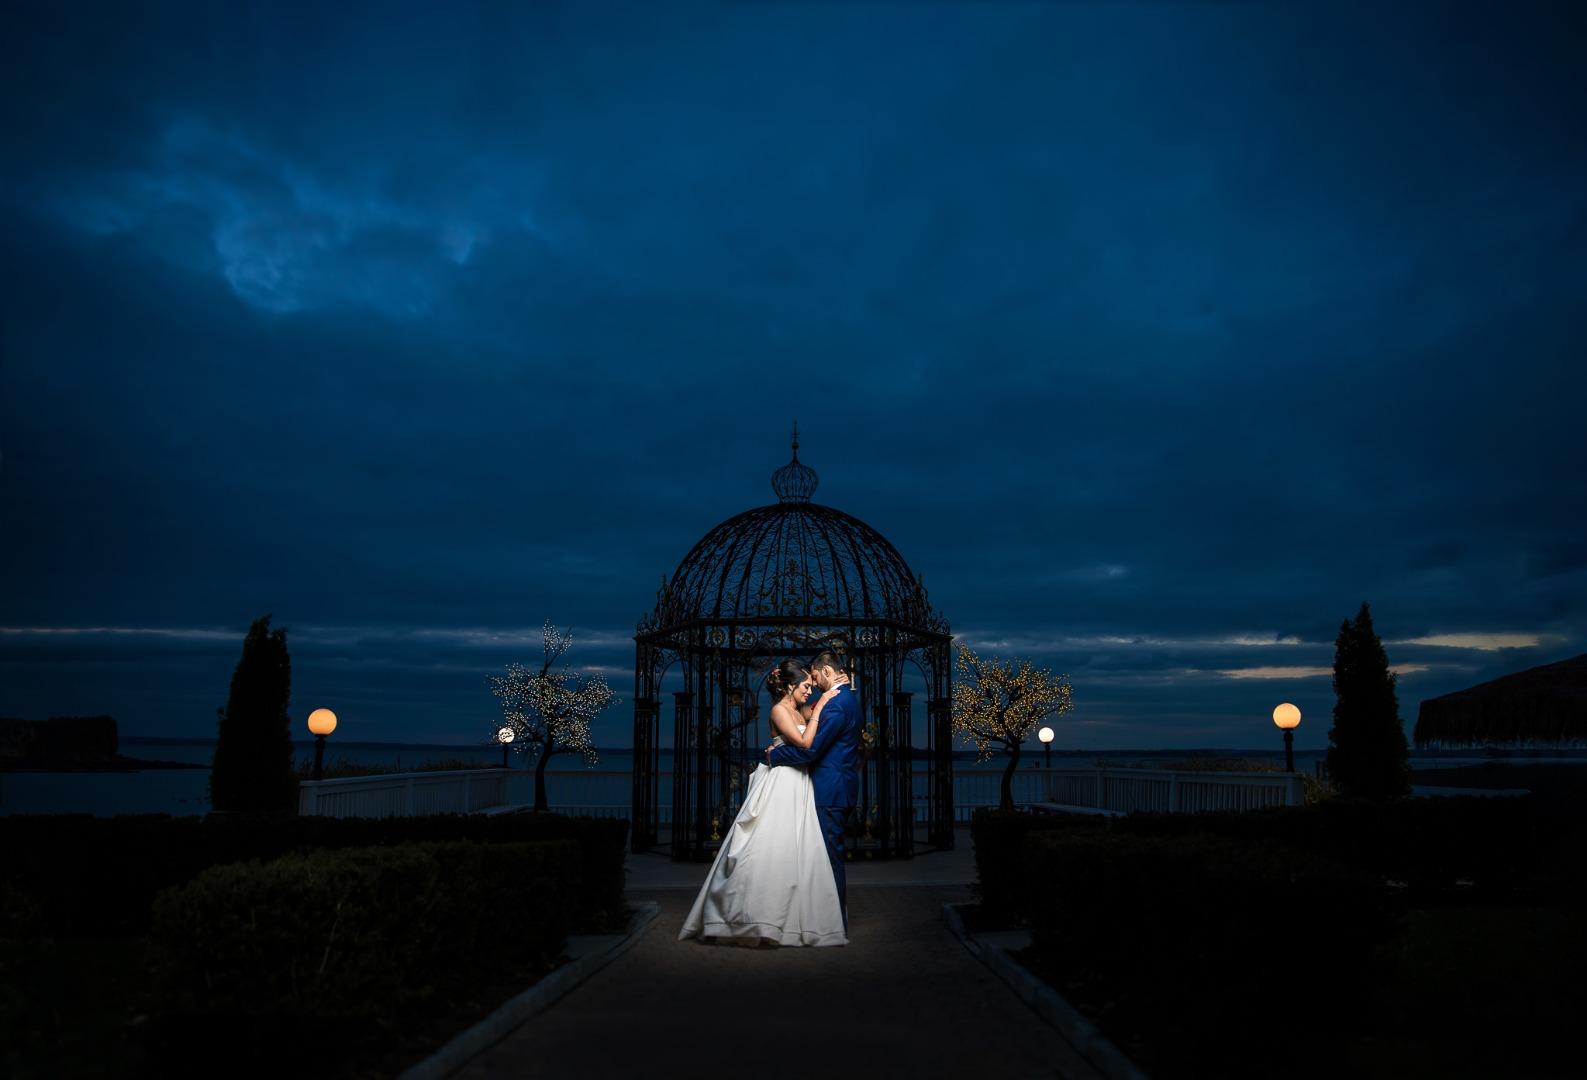 wedding couple poses photography